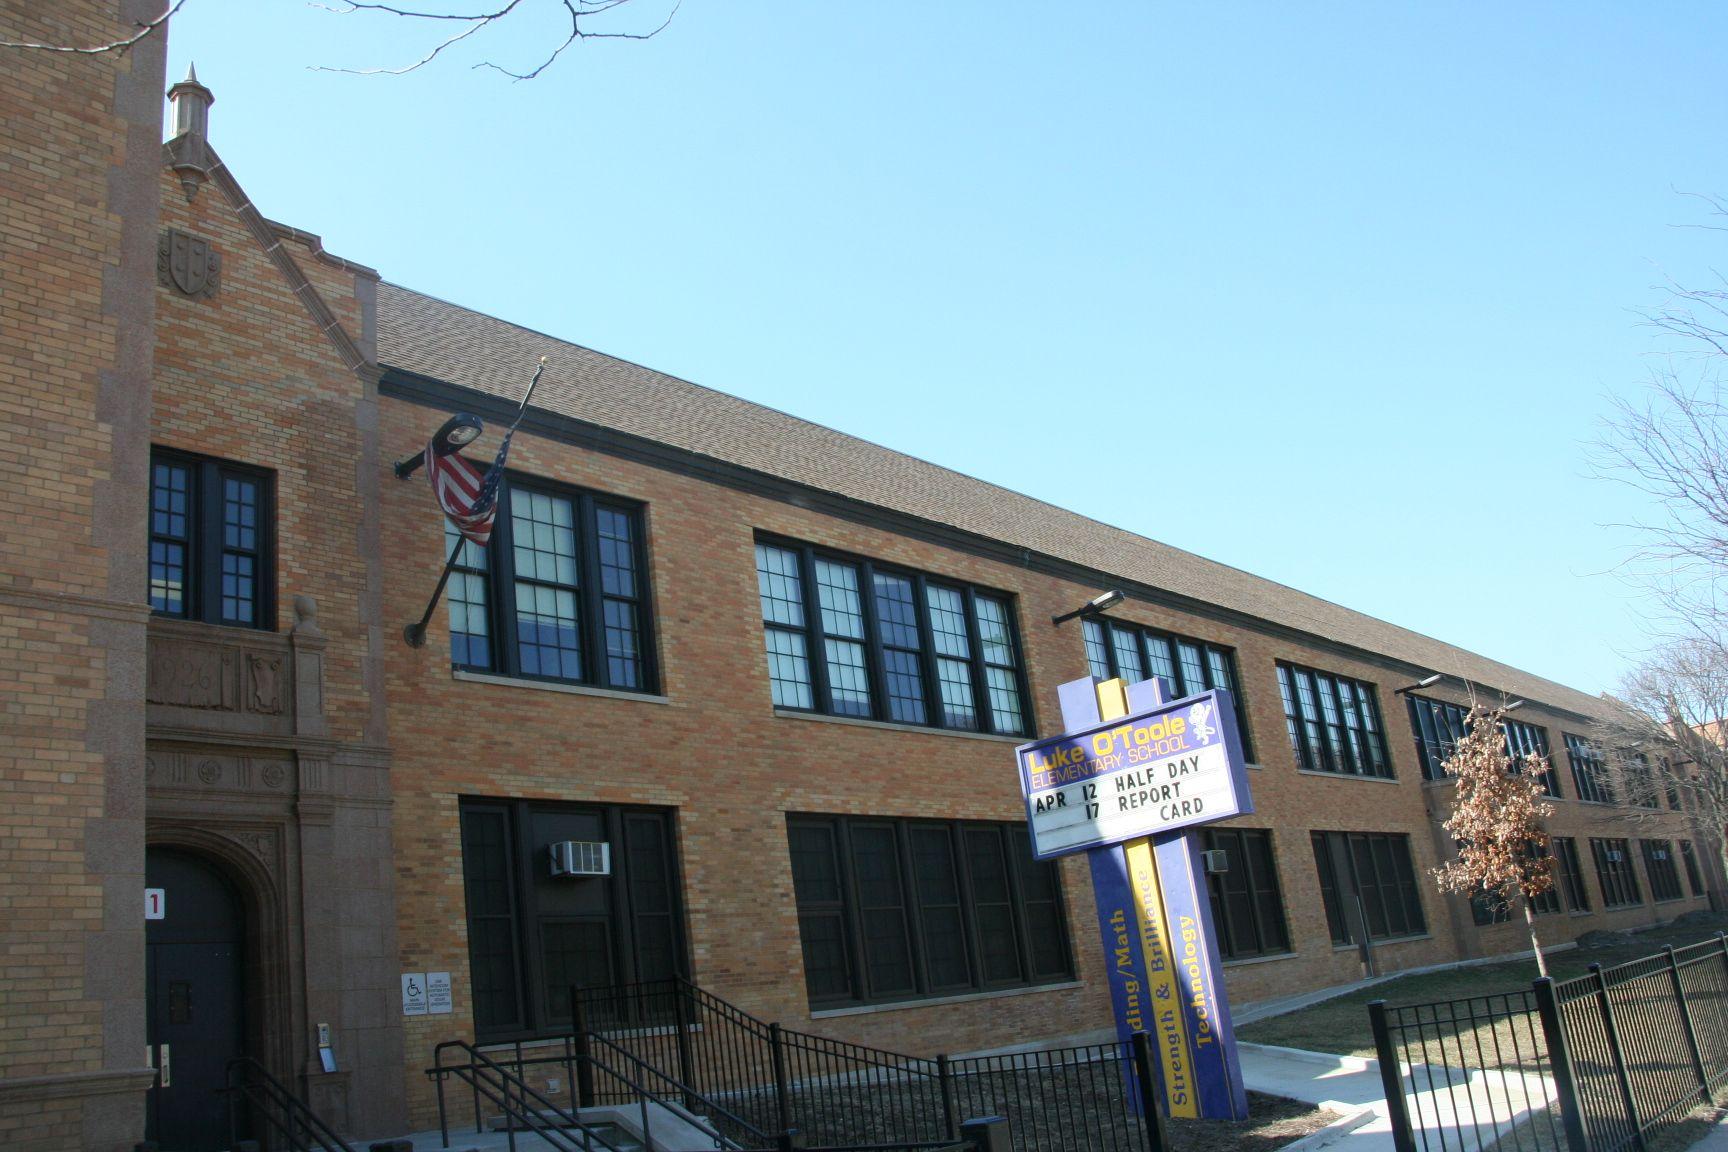 featured image Luke O'Toole Elementary School